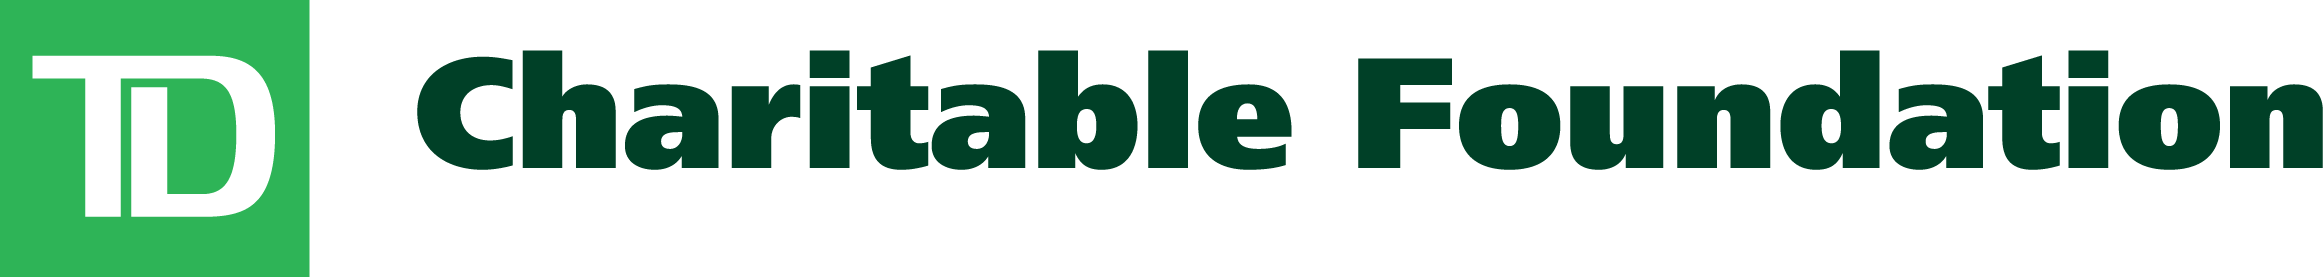 td-charitable-foundation-logo.png